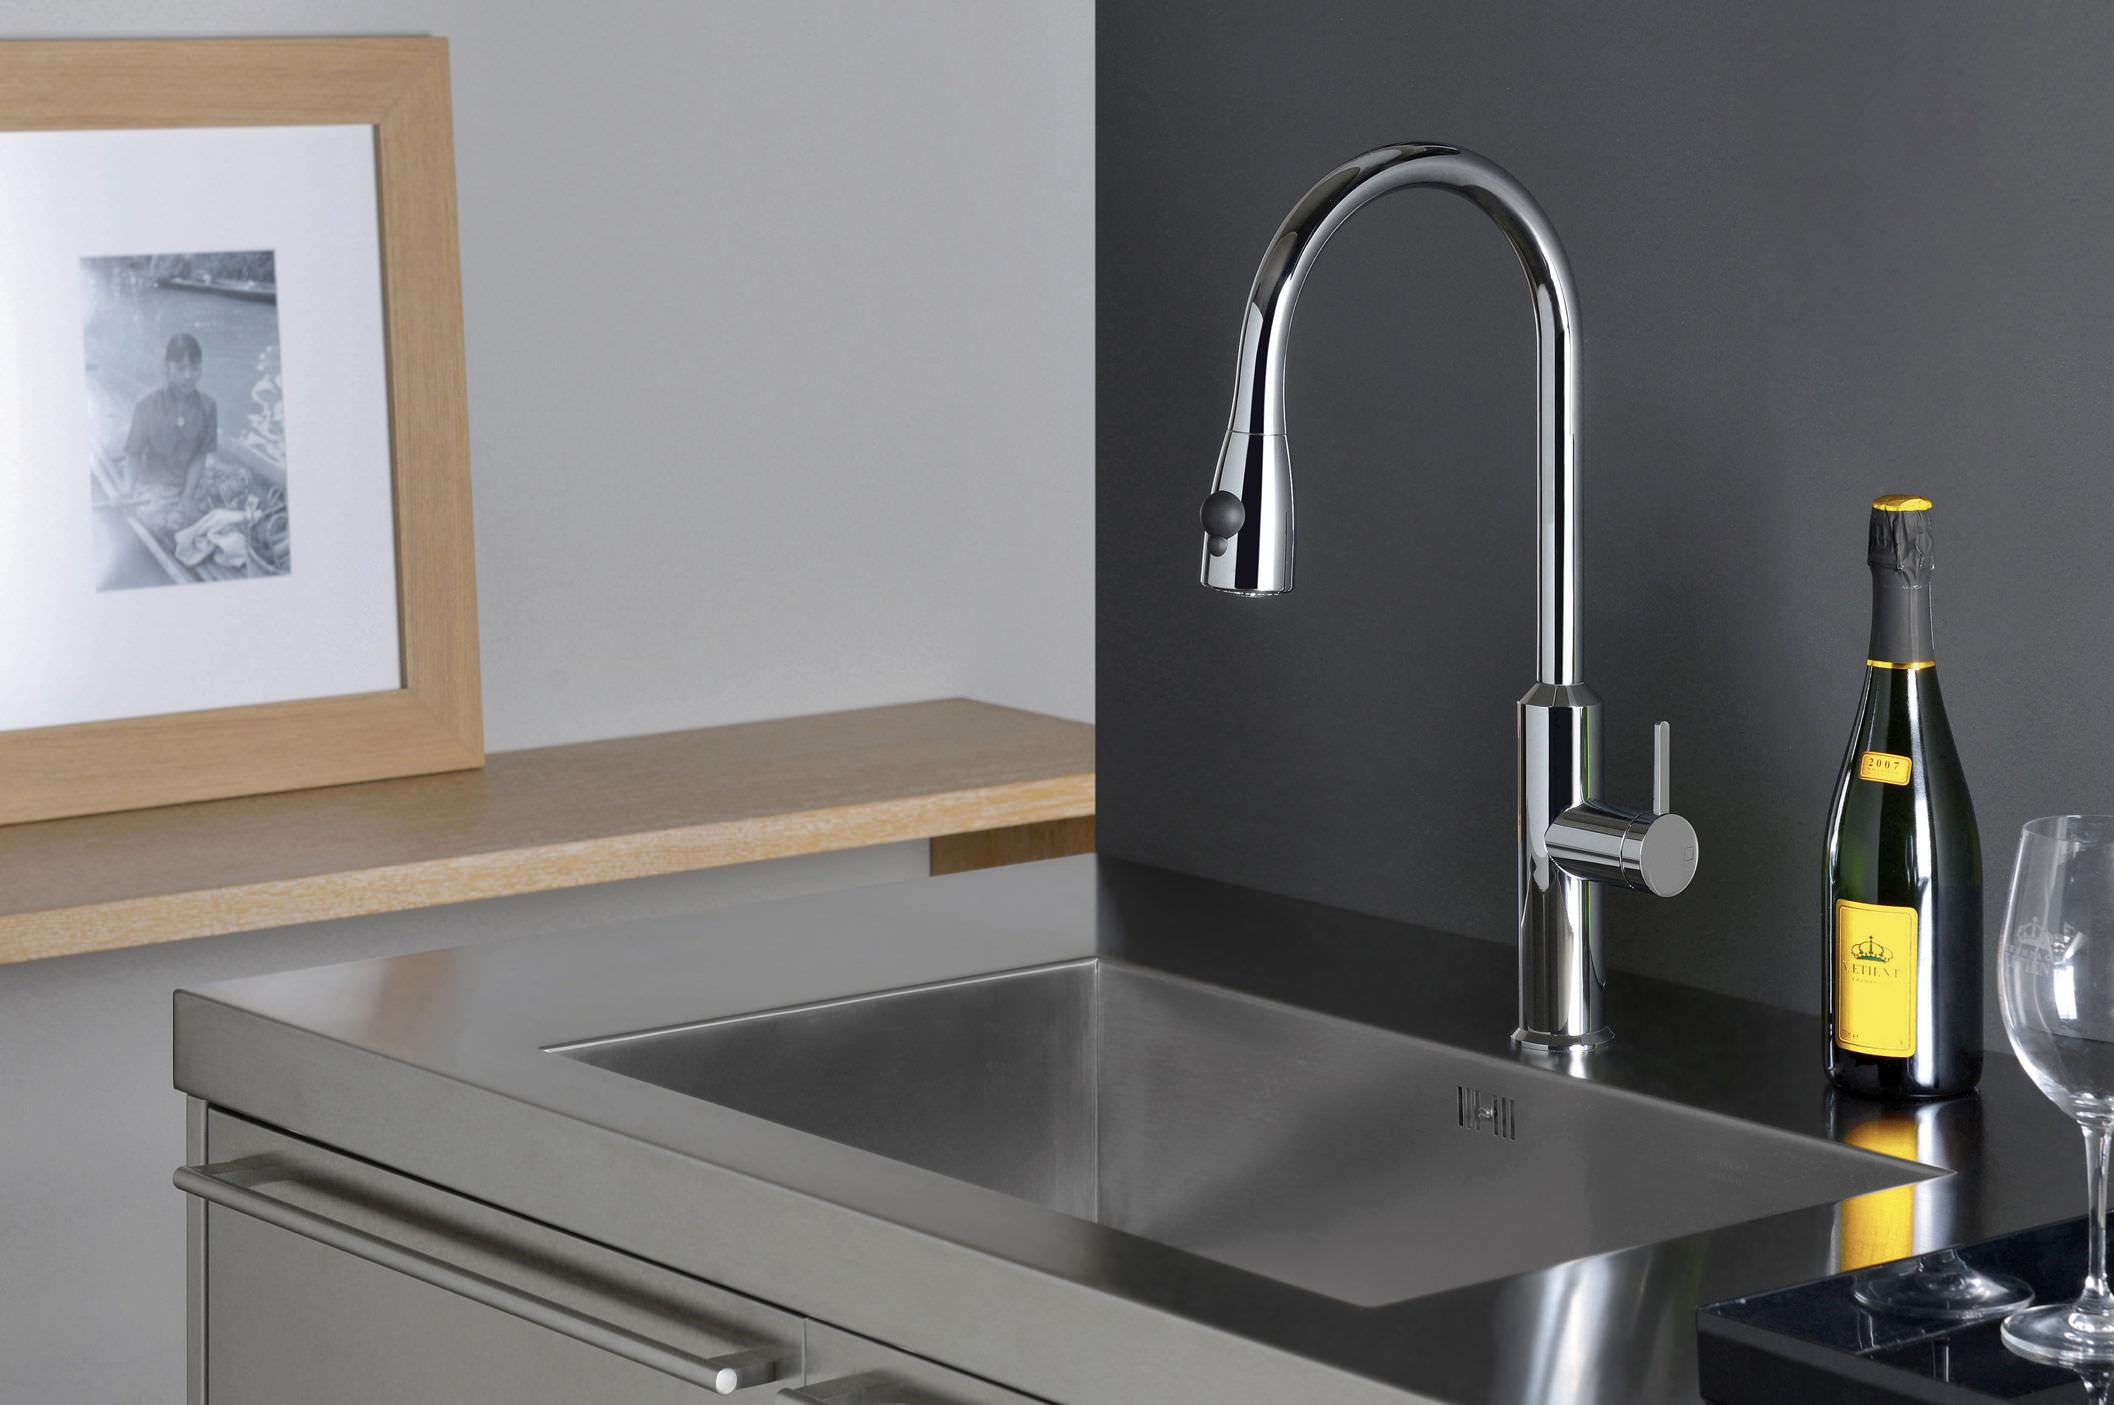 Beautiful Ikea Rubinetto Cucina Contemporary - Ideas & Design 2017 ...